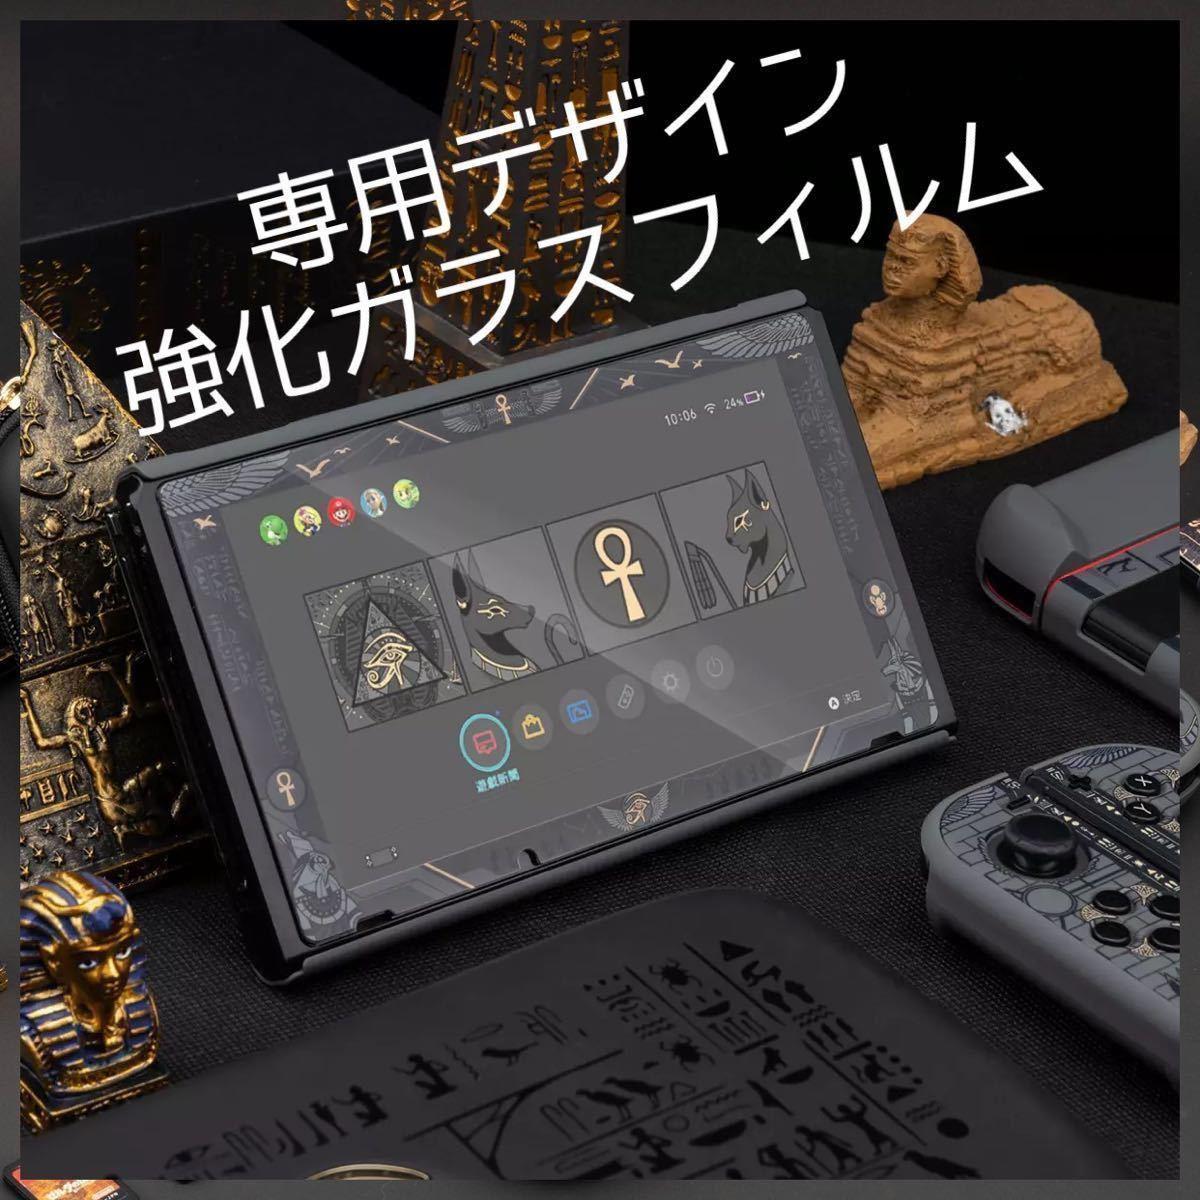 switch ケース カバー スイッチケース 専用カバー Nintendo 任天堂 かっこいい 黒 フリーメイソン  ホルスの目